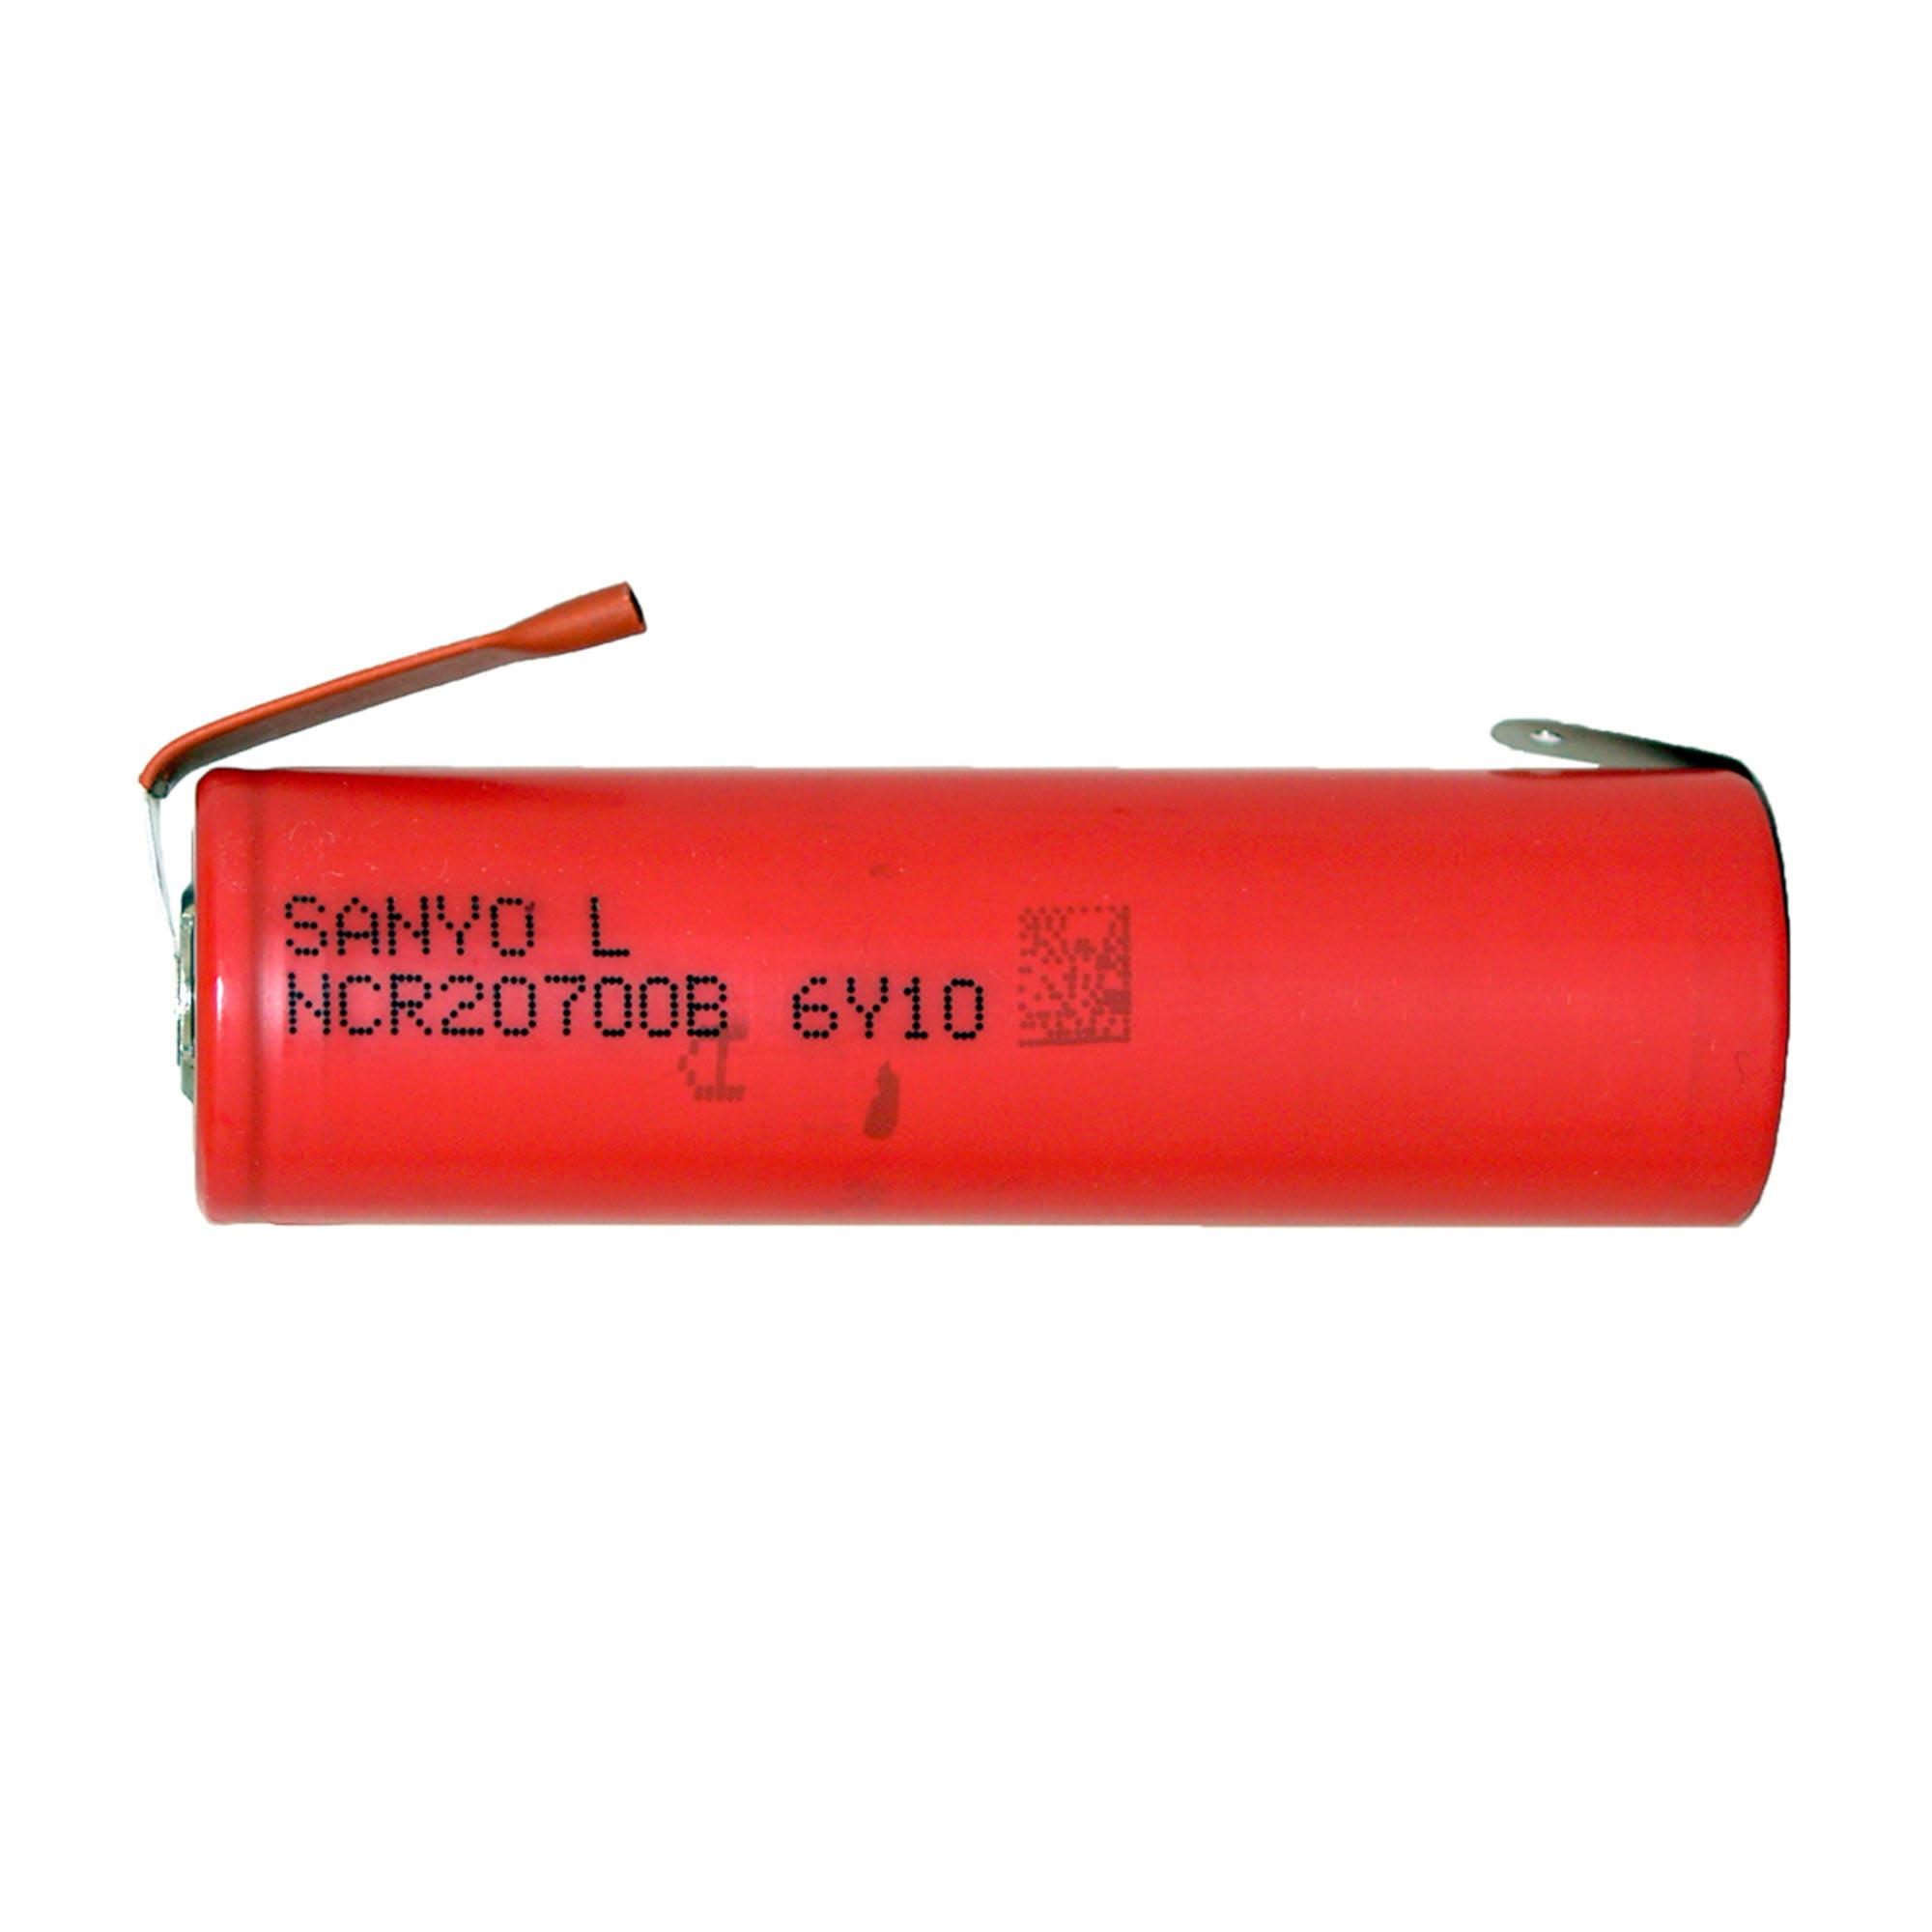 Sanyo / Panasonic 20700B 3.7V Lithium Ion Battery (4250 mAh) w/ Tabs - image 1 de 1